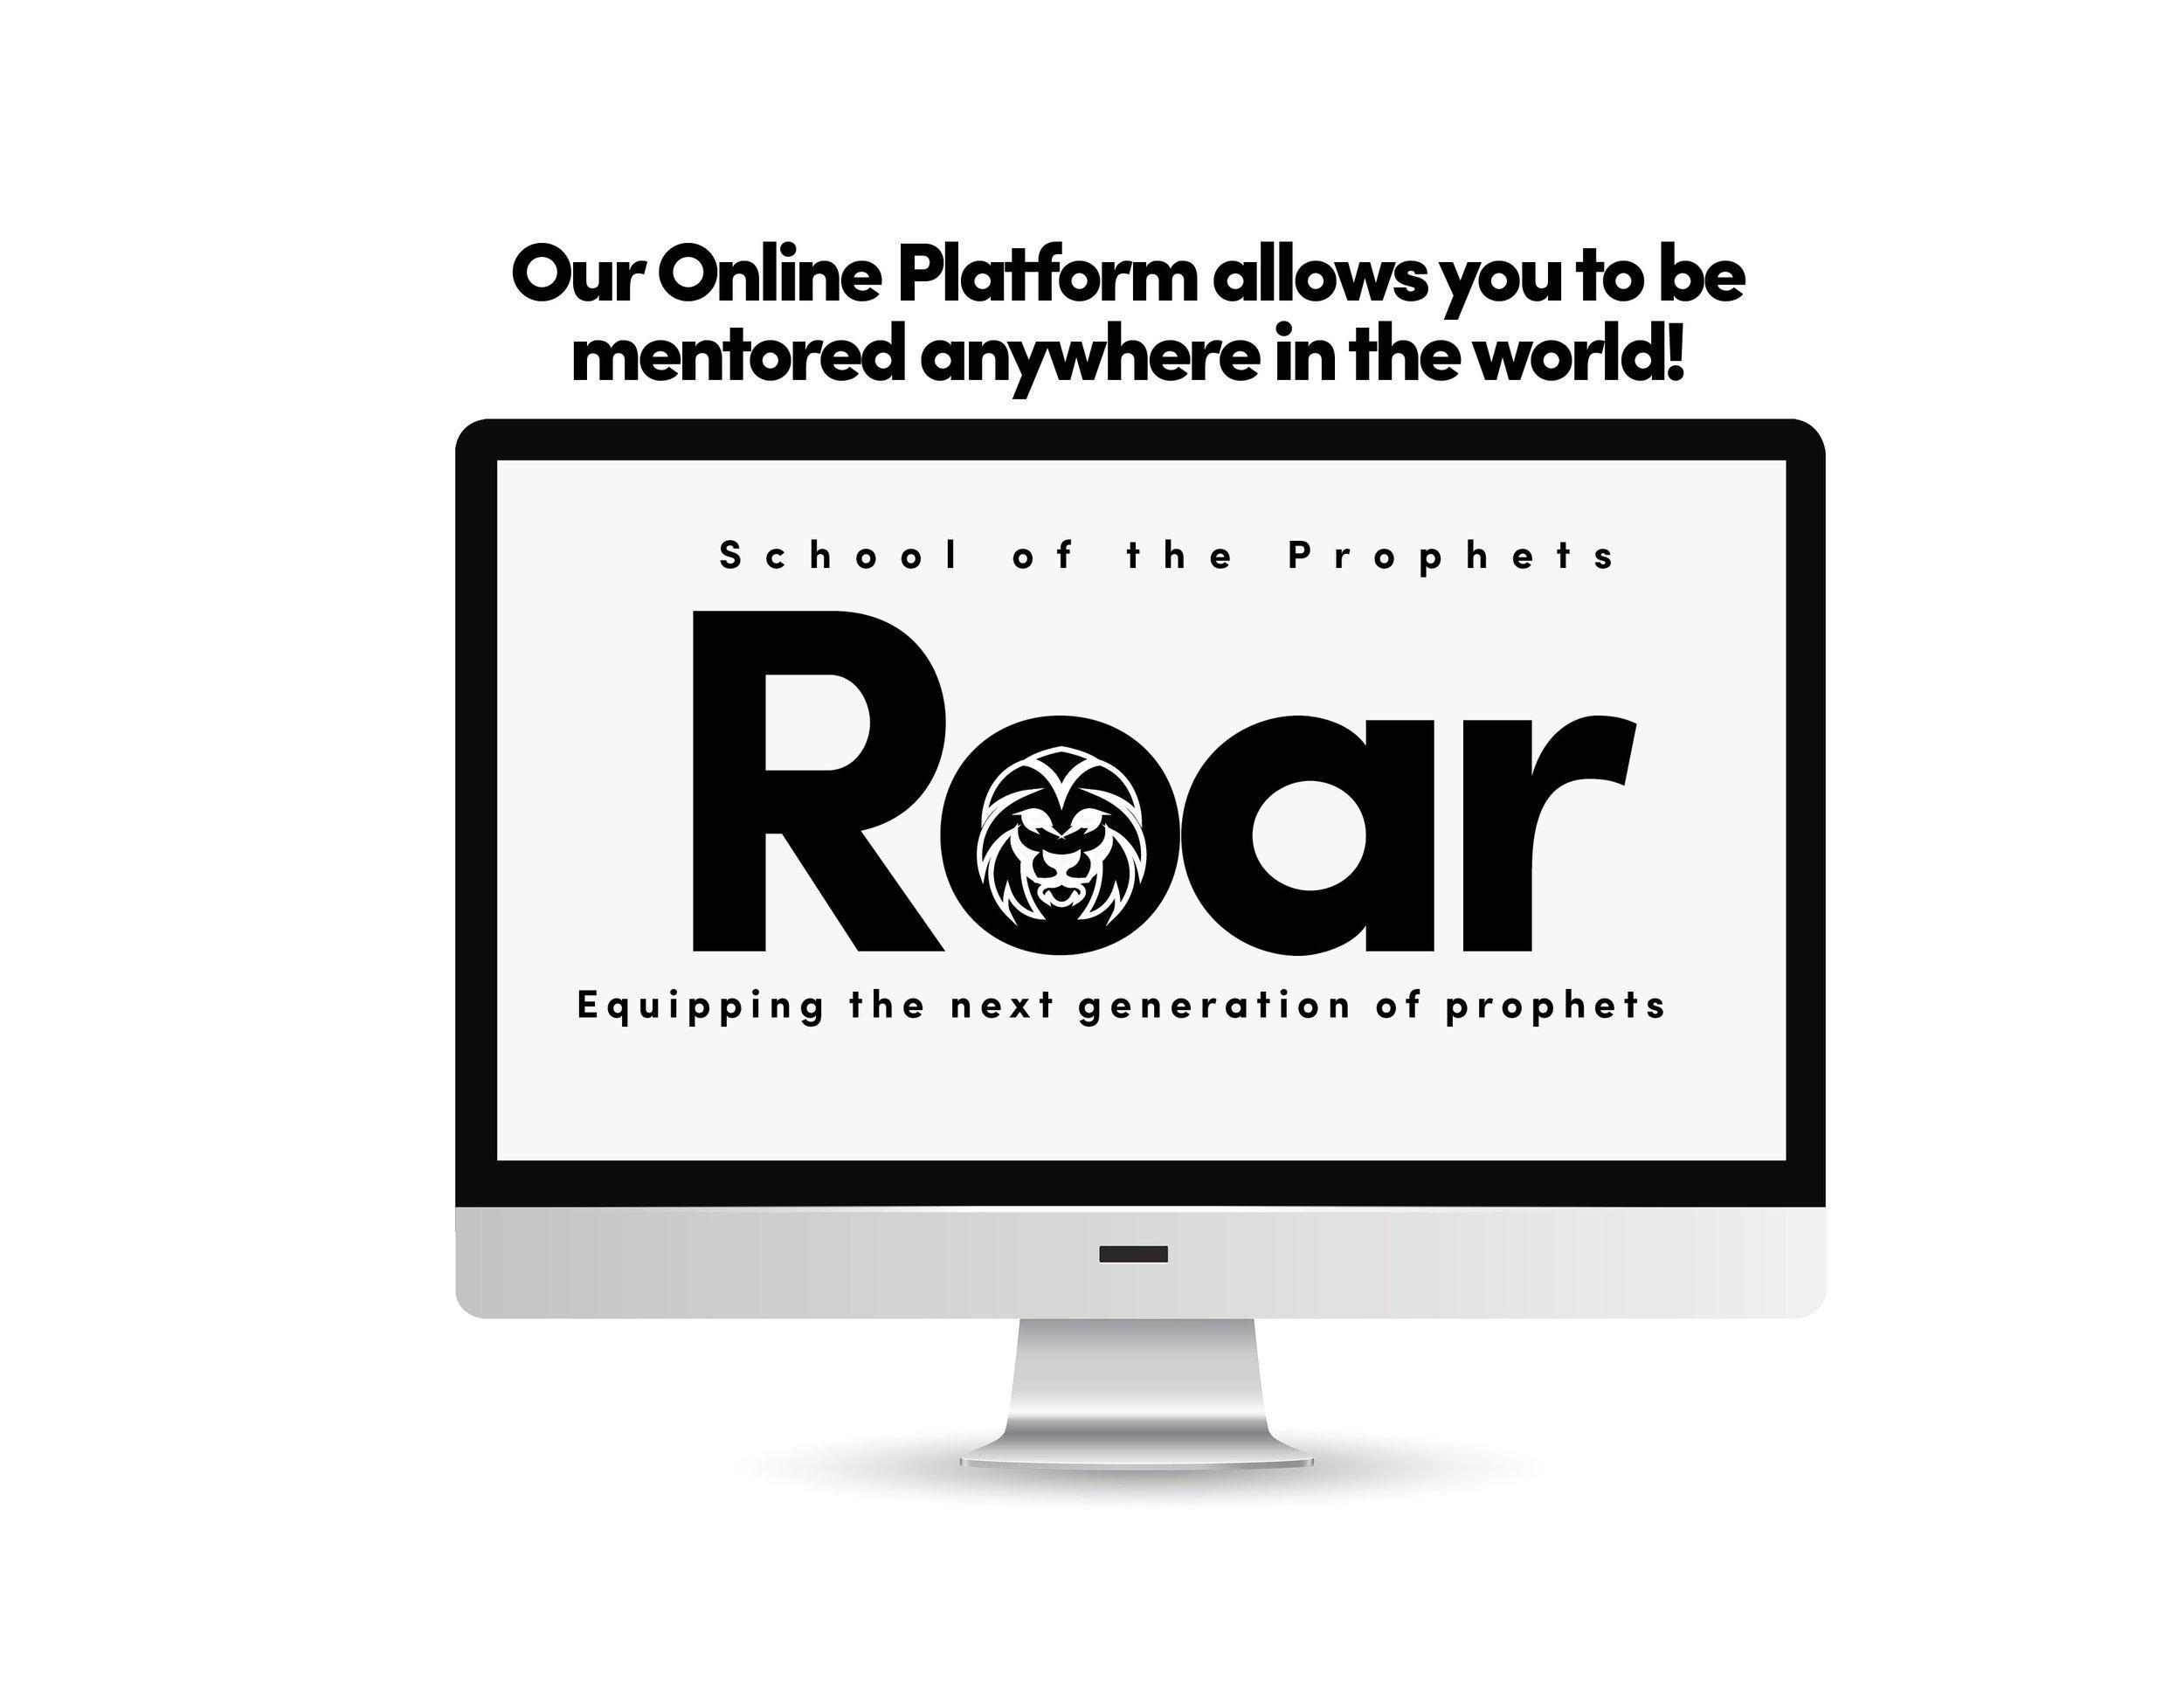 roar on platform.jpg